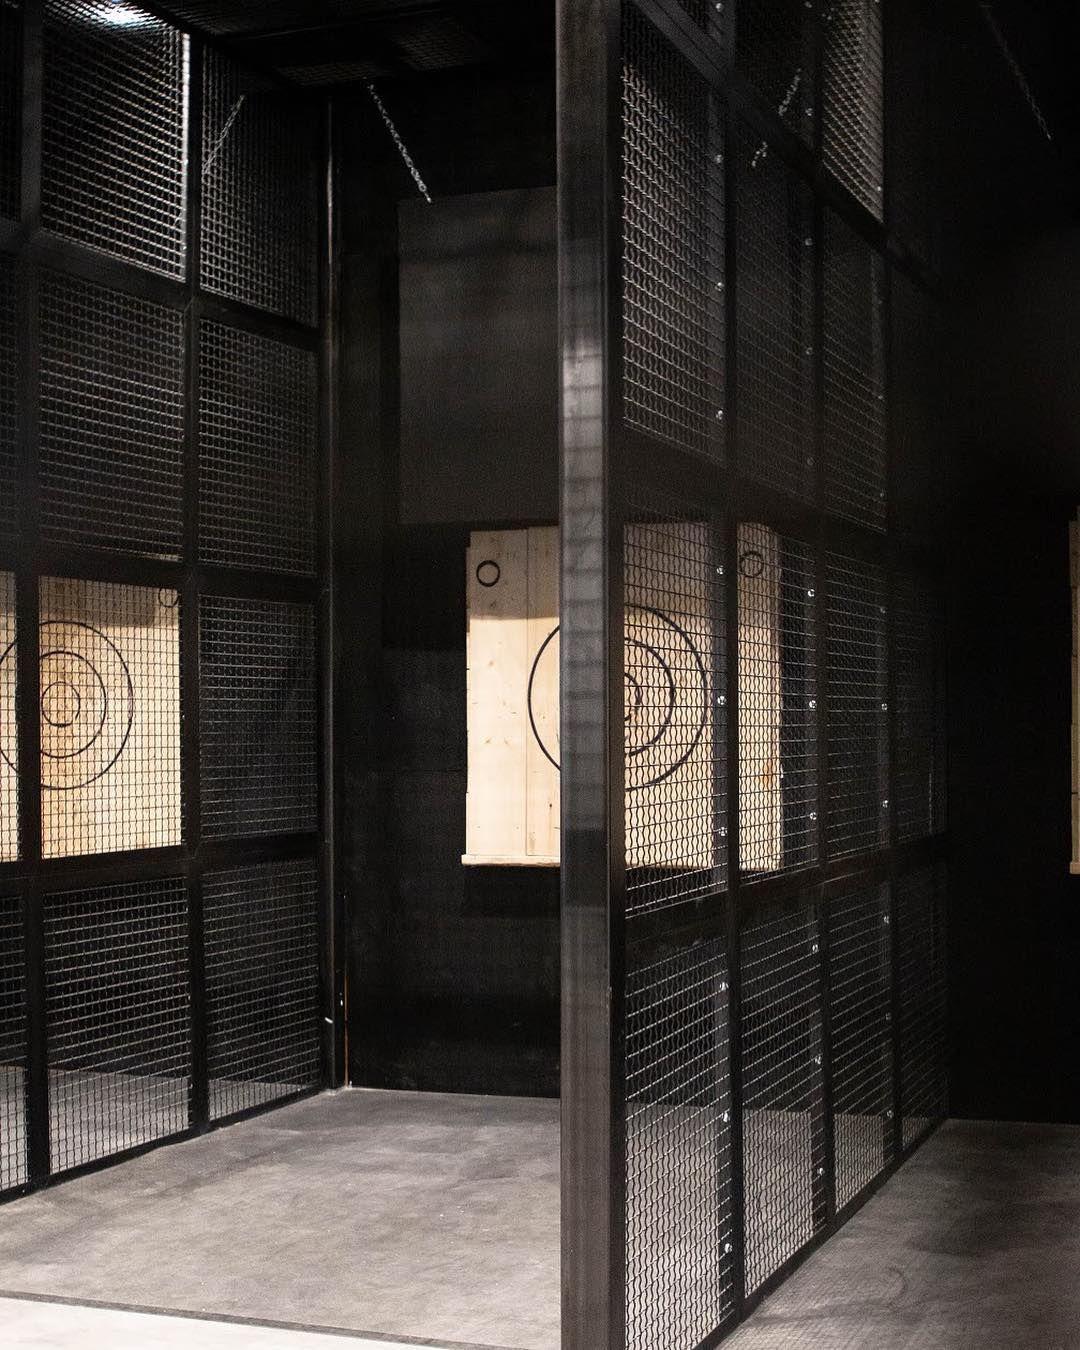 Pin By Ian Roome On Whistle P In 2020 Metal Fabrication Metal Furniture Custom Metal